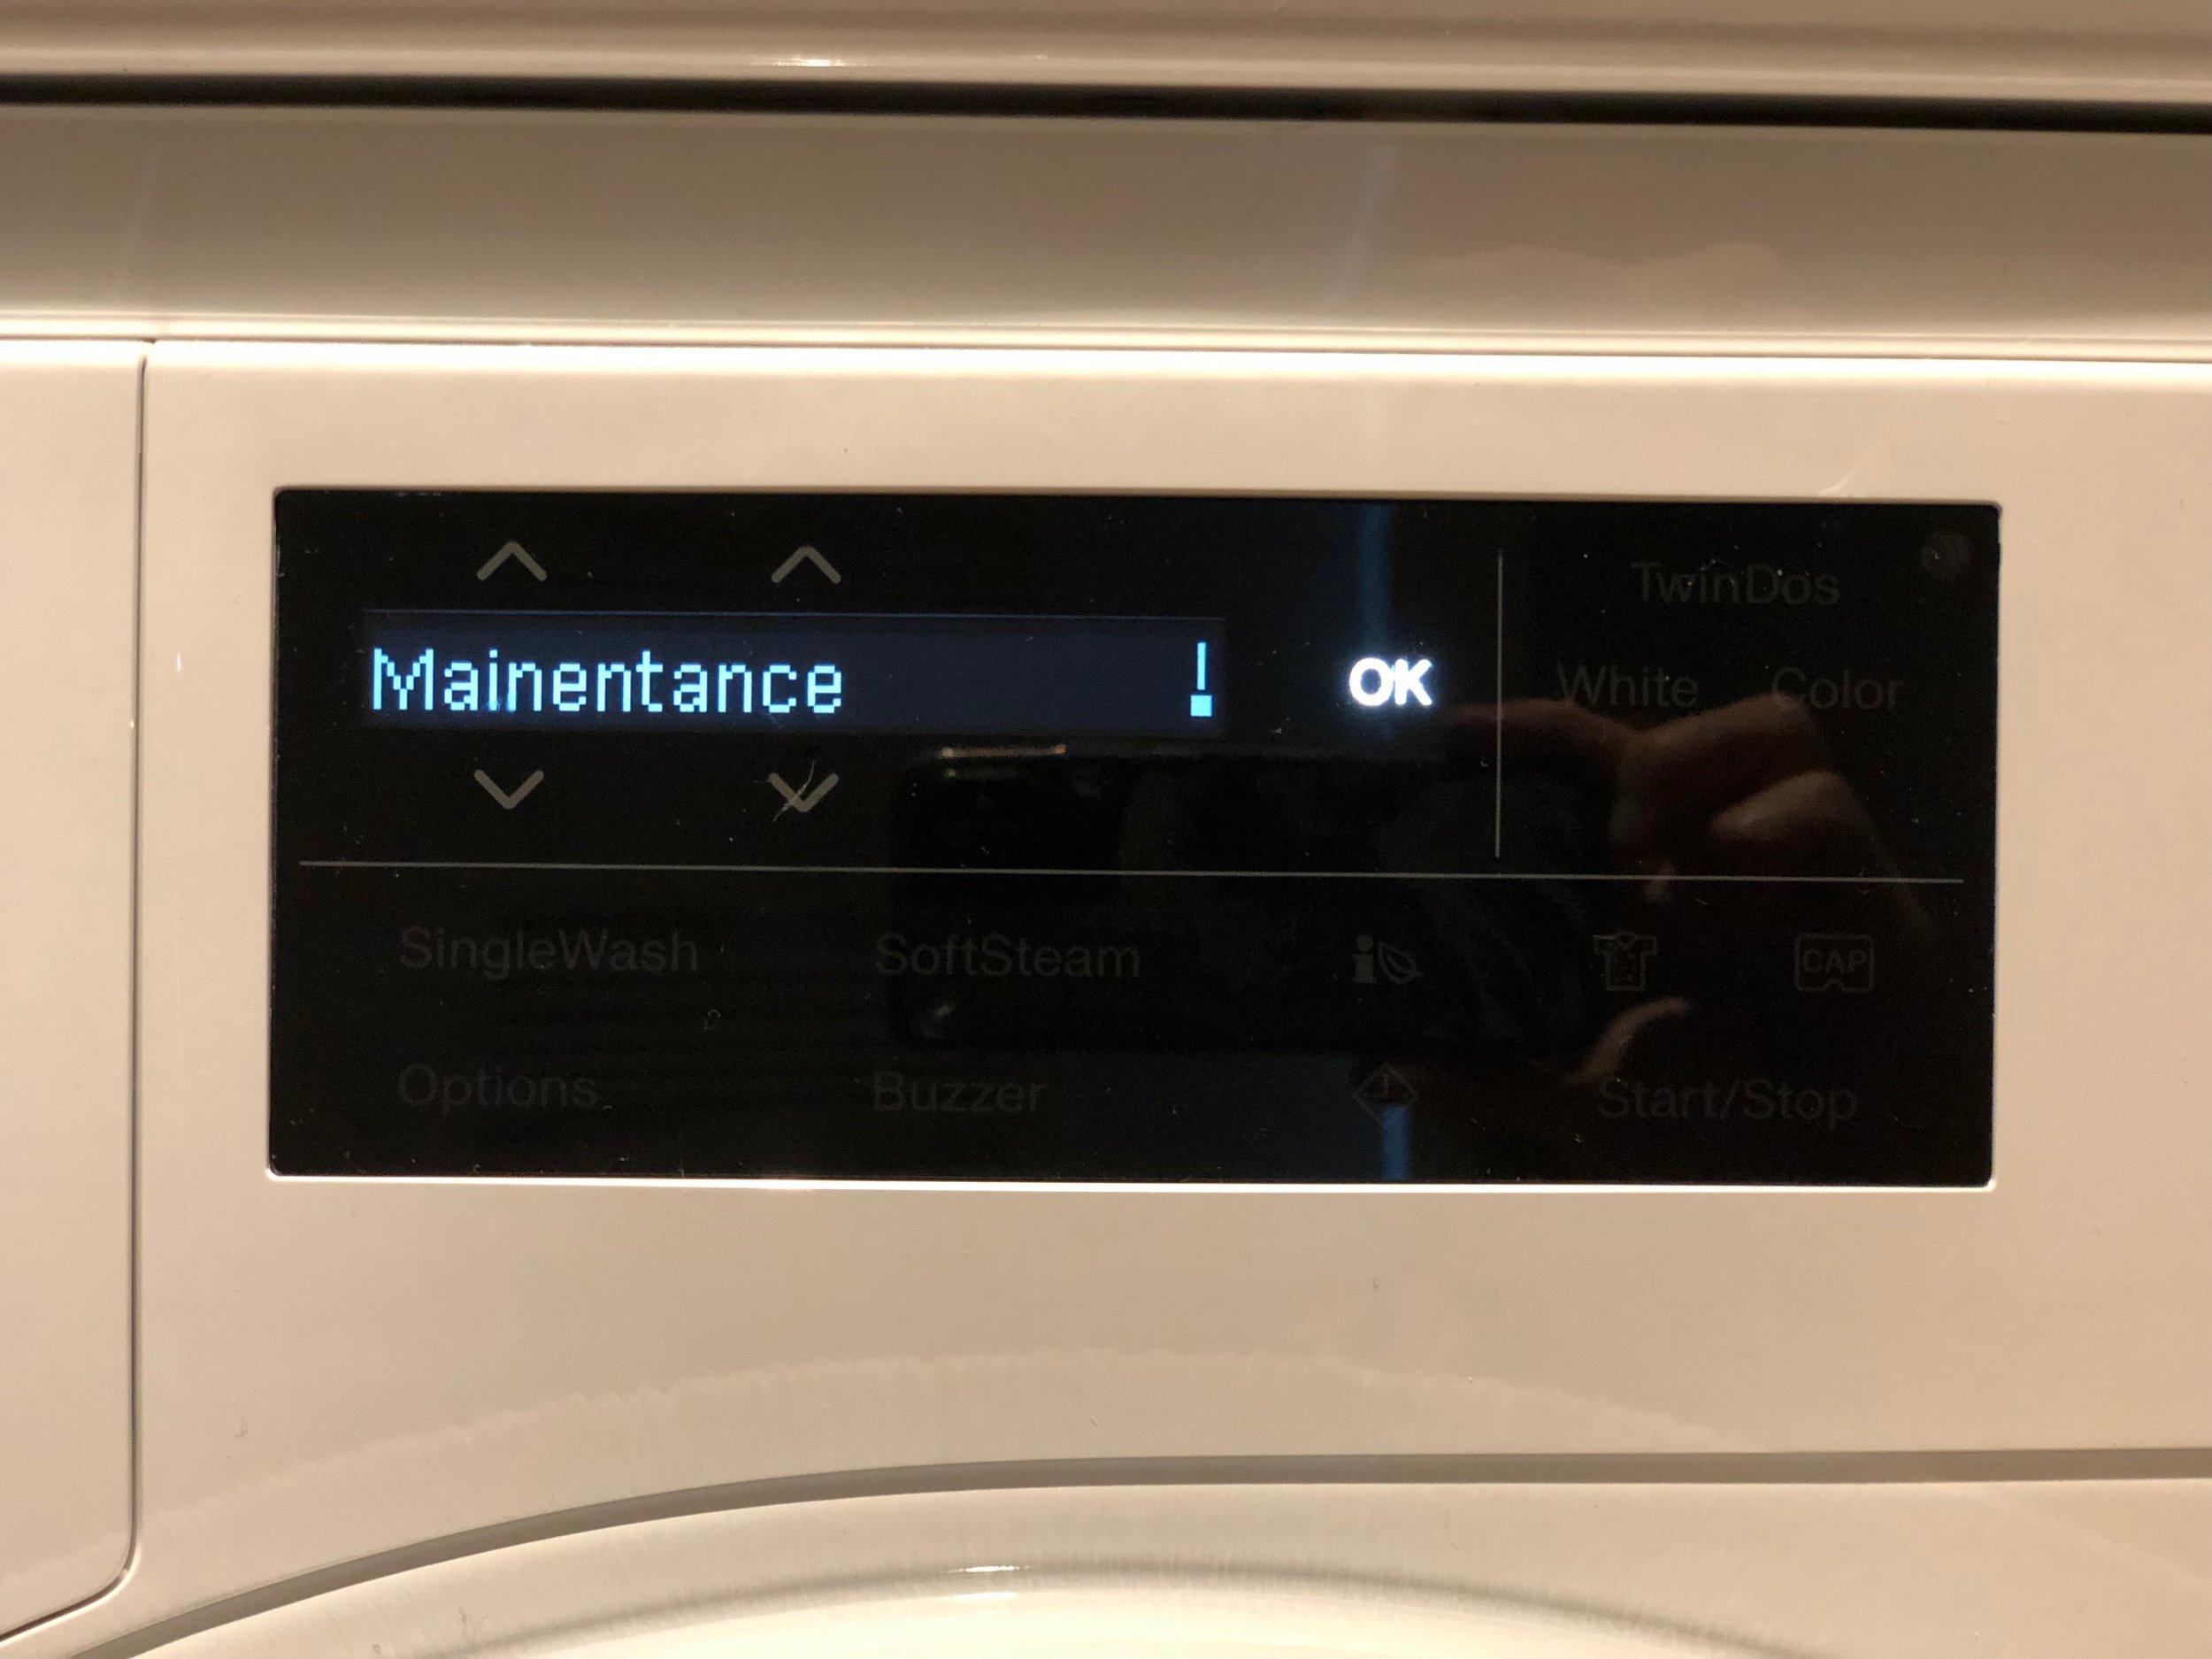 The Mainentance (sic) program on my new washing machine.